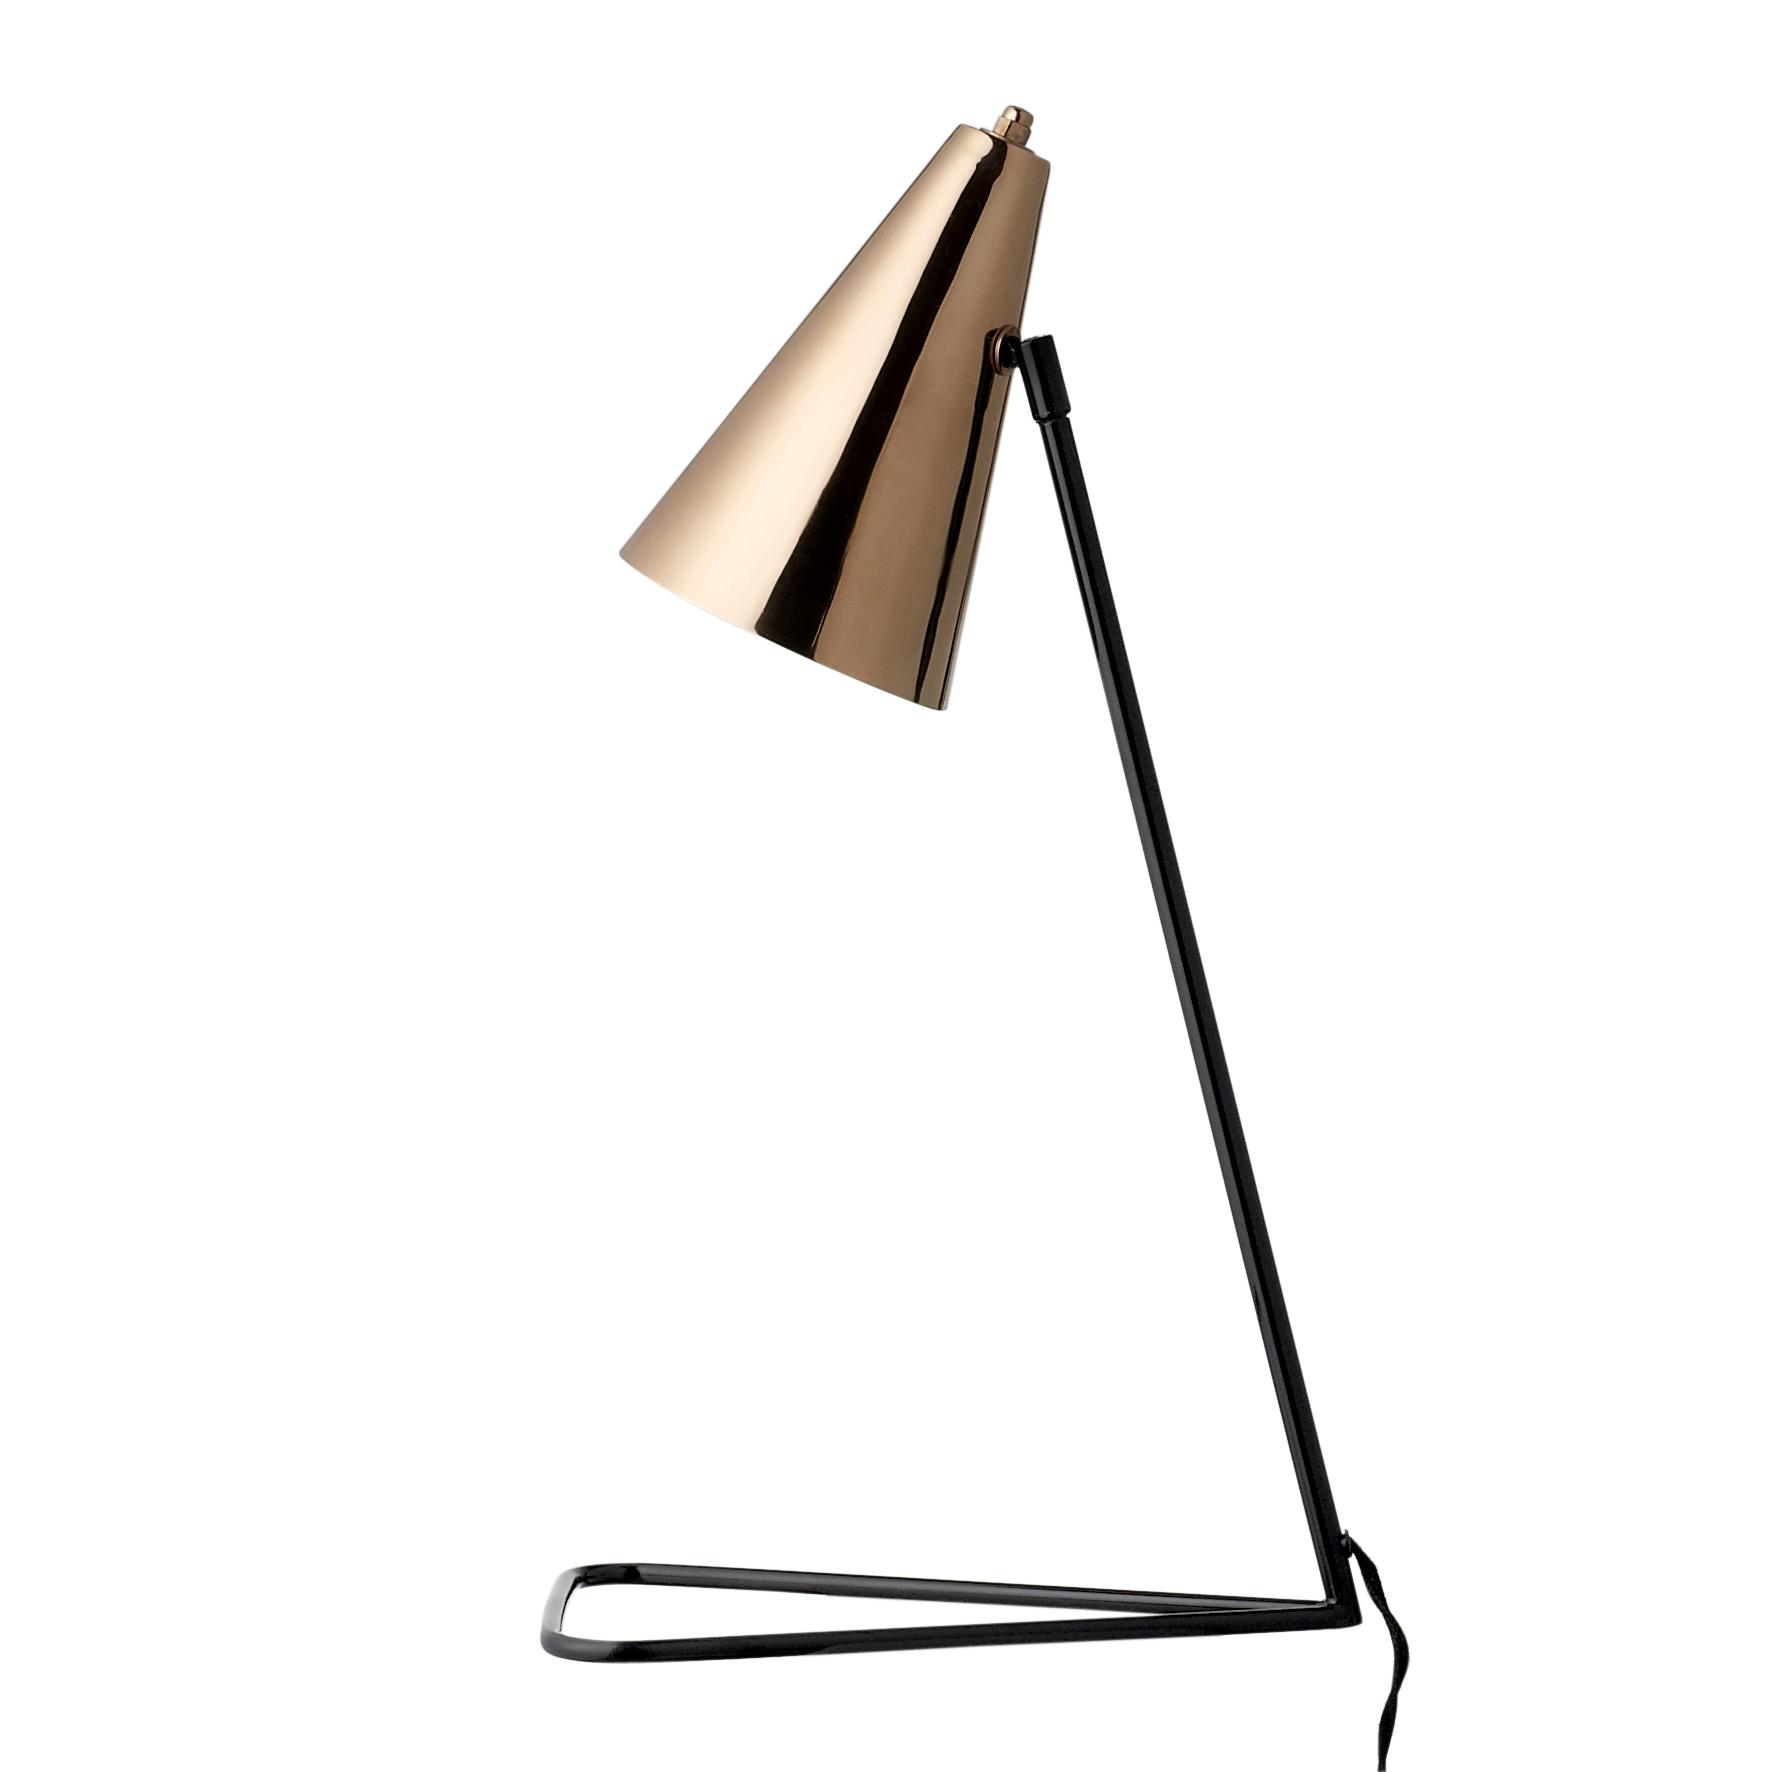 Bordslampa med kopparskärm 489077, Bloomingville